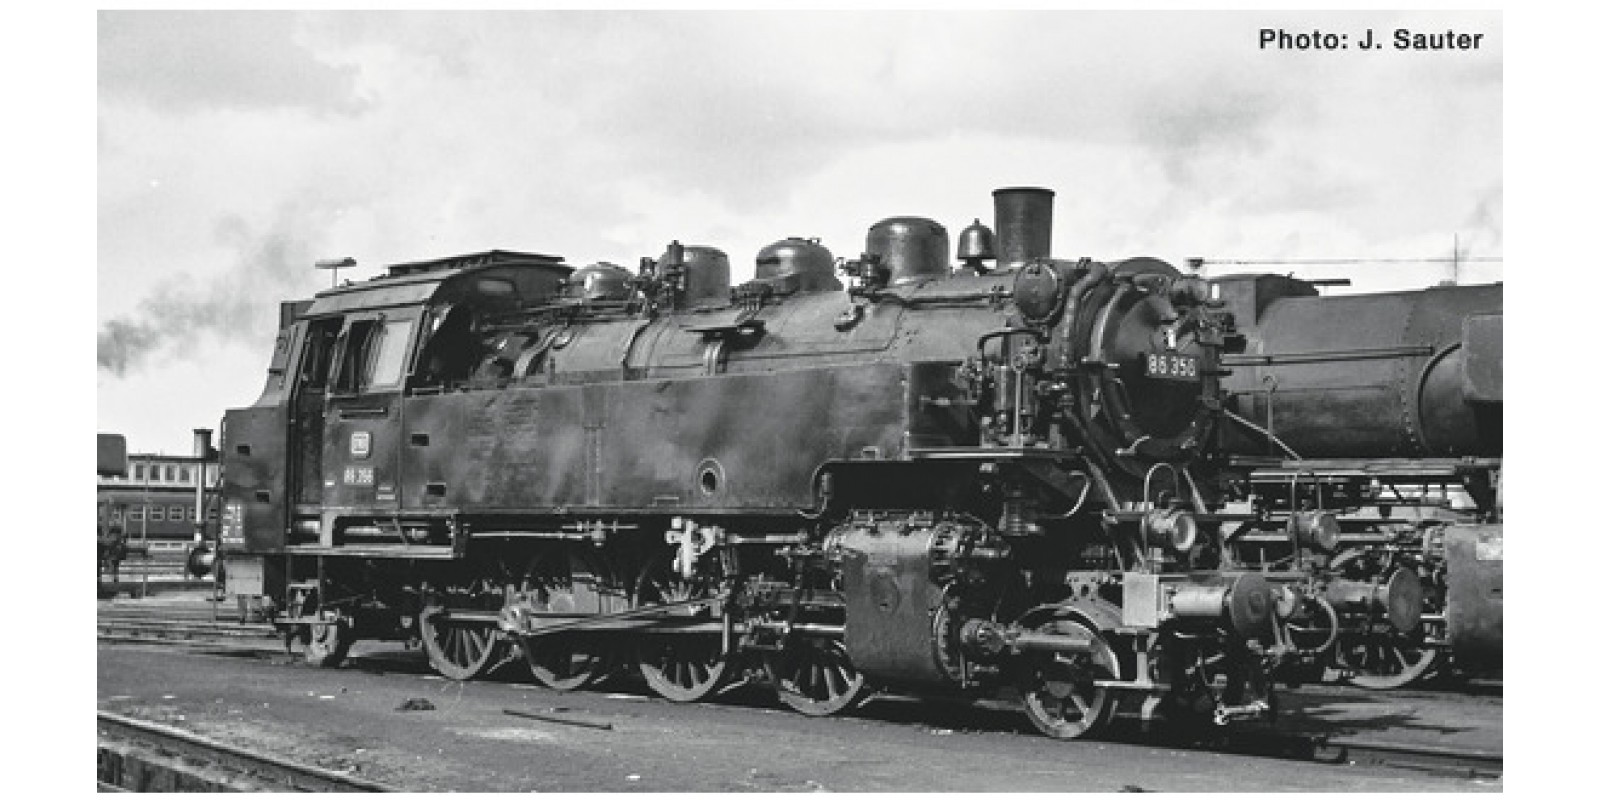 RO73023 Steam locomotive class 86, DB